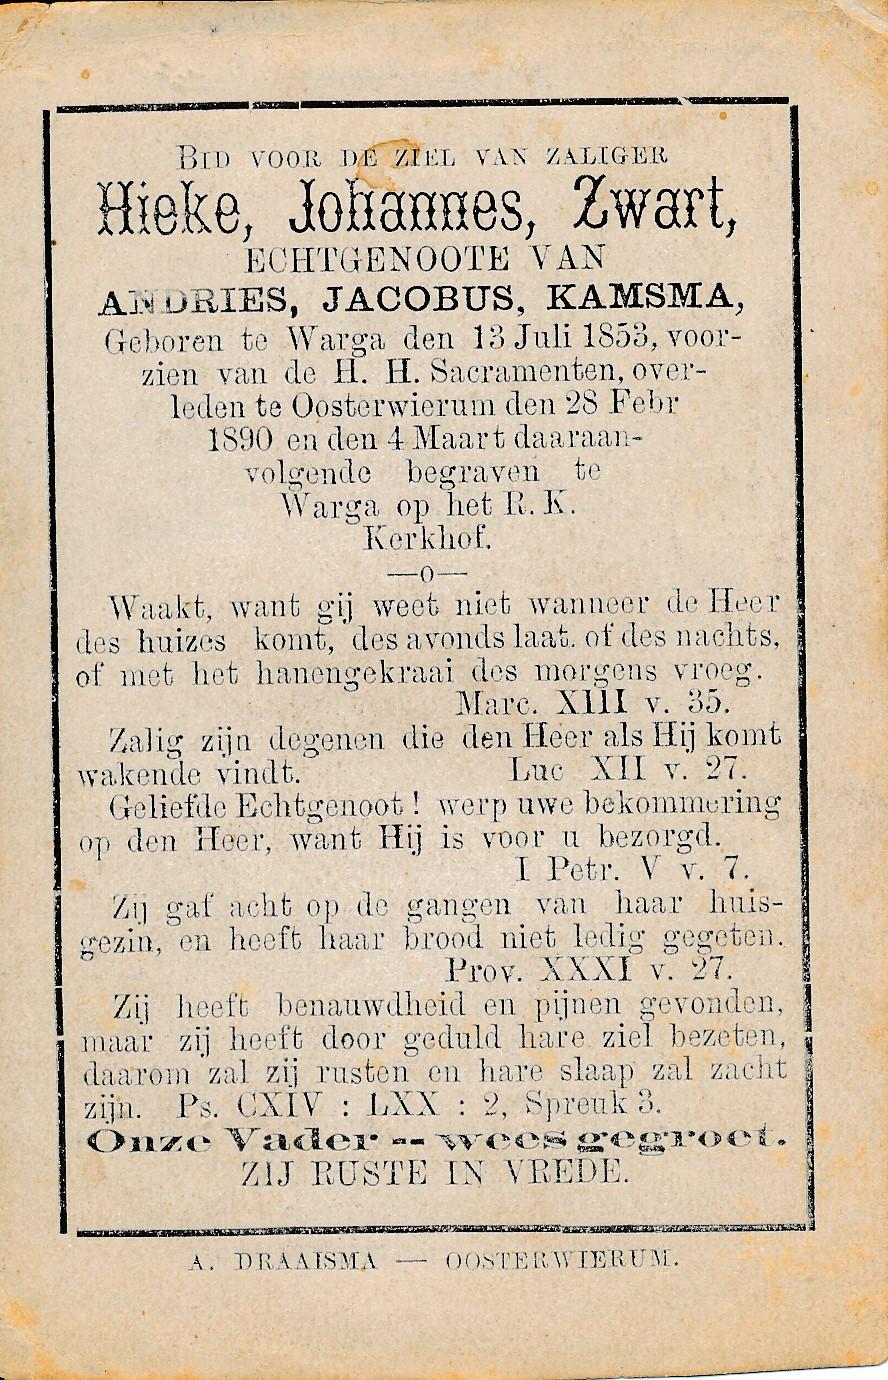 Fotoalbum Andre Kamsma, 112, Hieke Johannes Zwart, frou fan Andries Jacobus Kamsma, 13-07-1853 tot 28-02-1890